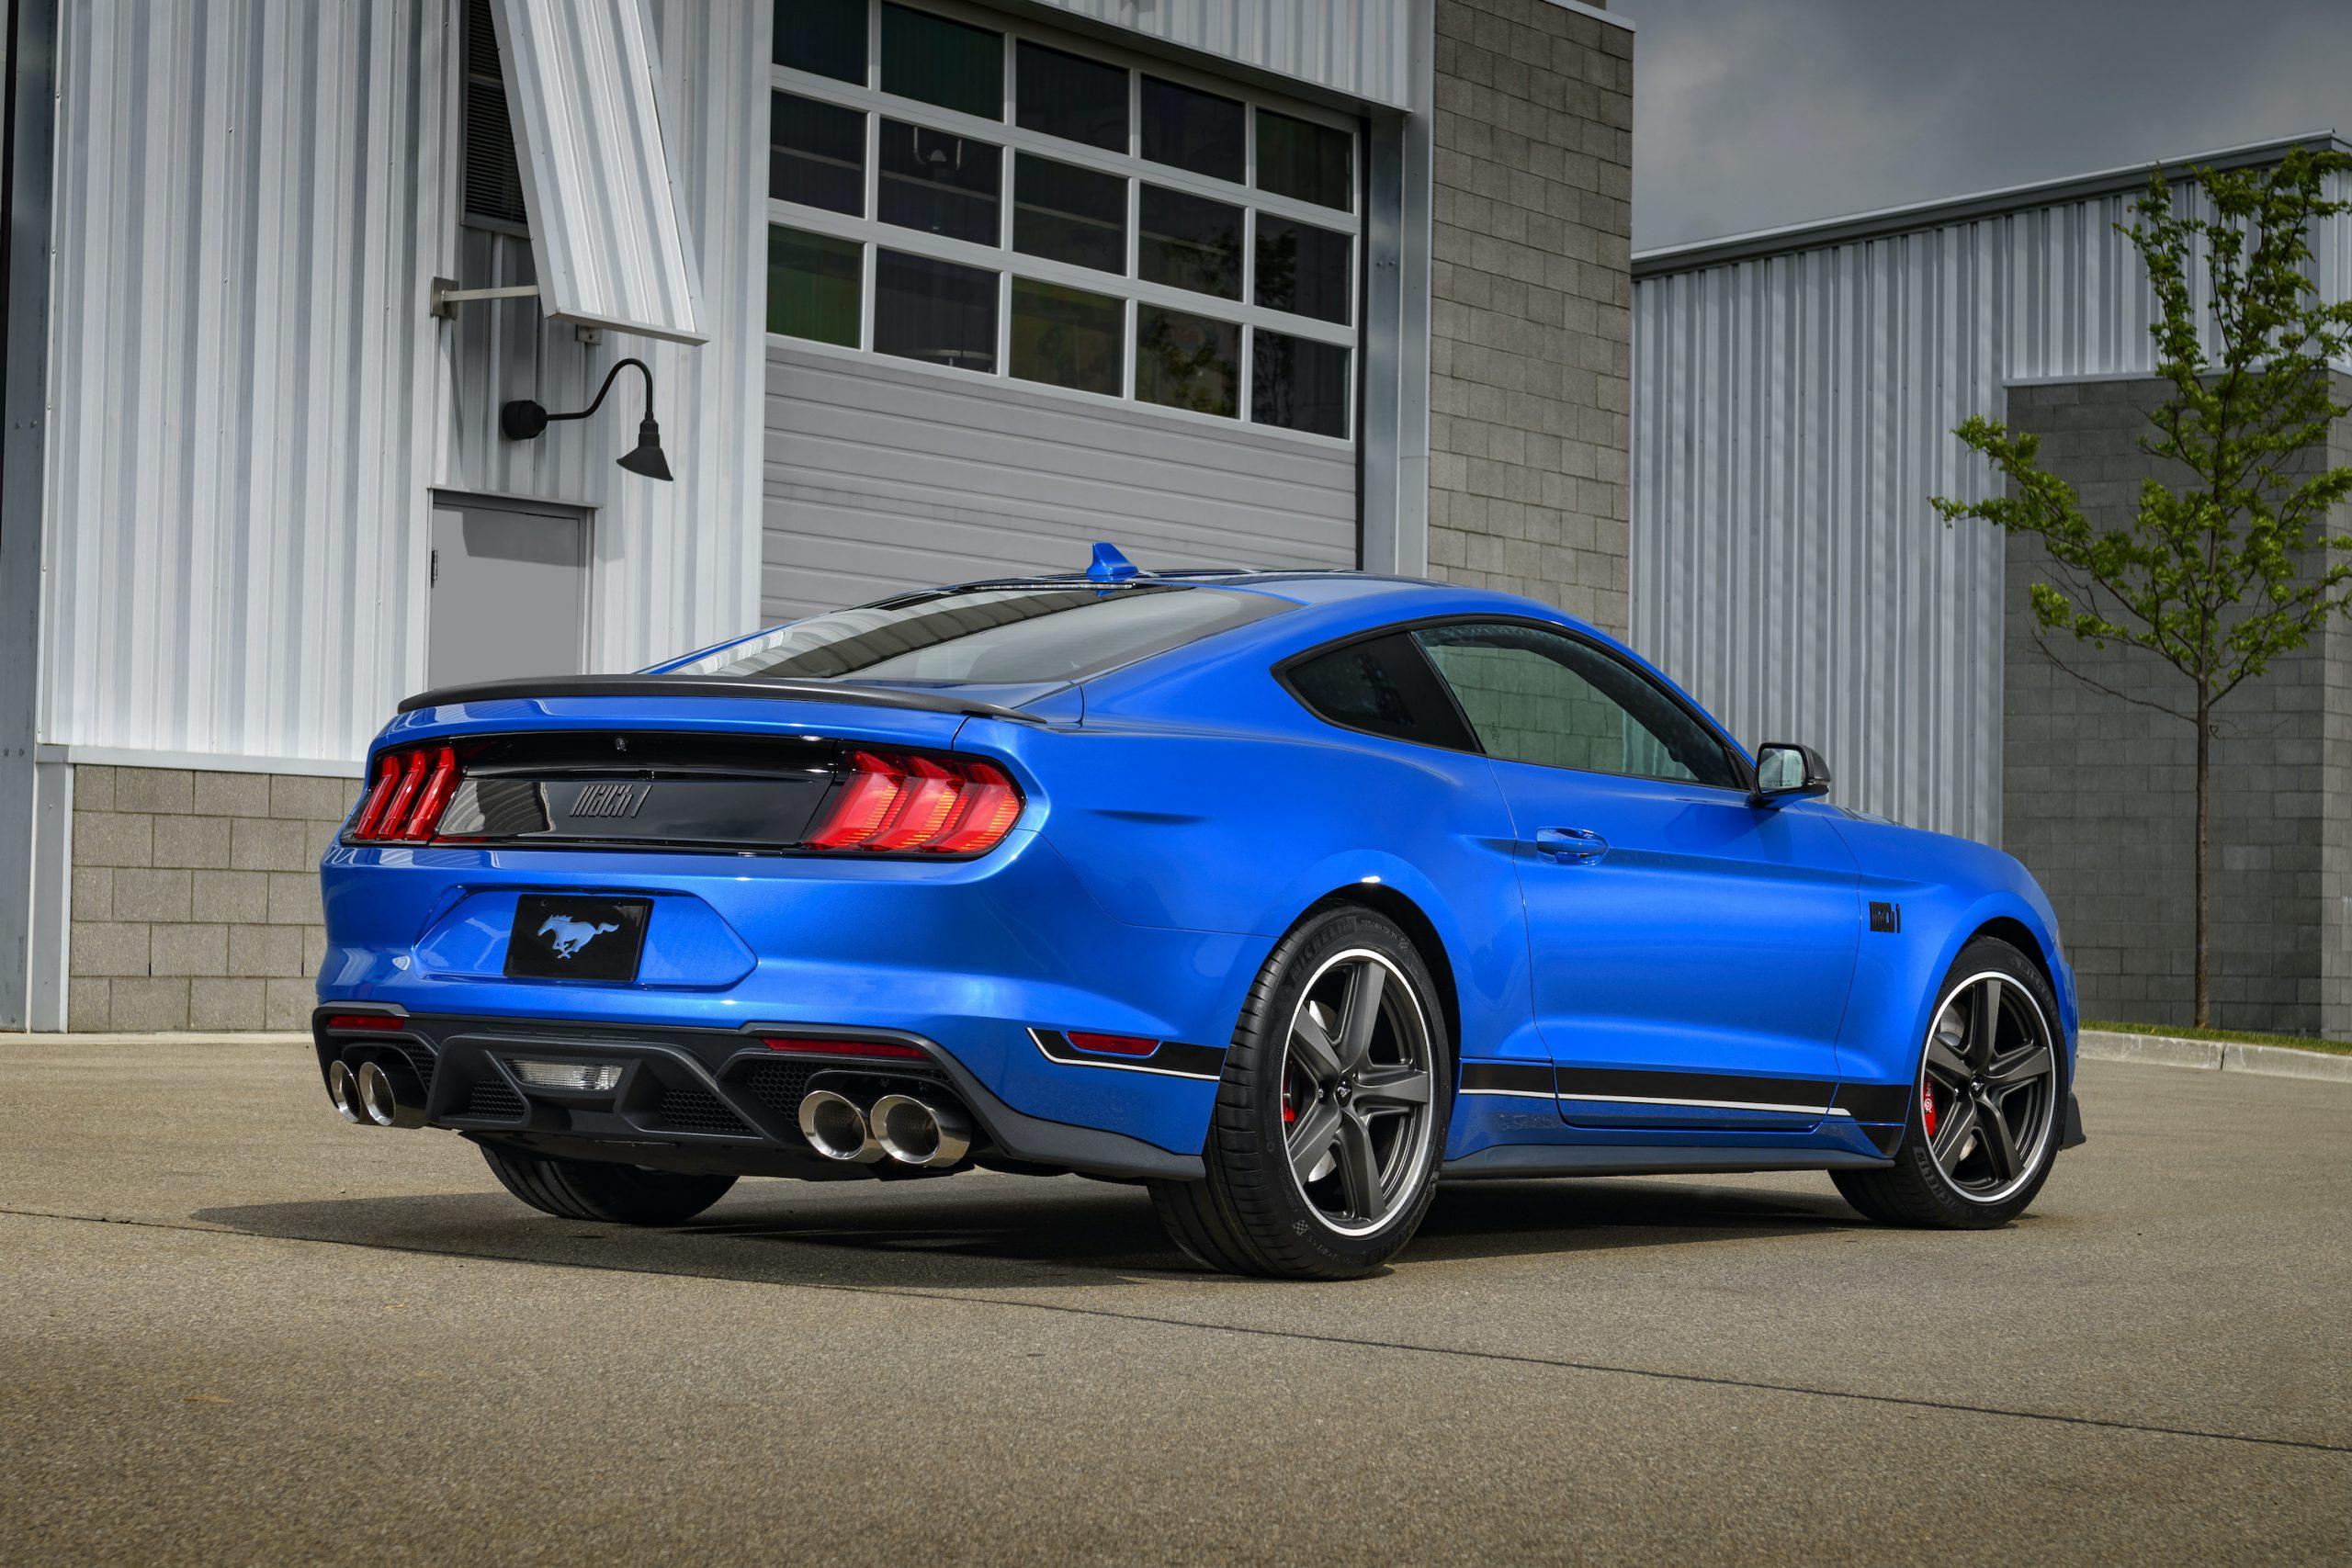 2021 Ford Mustang Mach 1 rear three-quarter